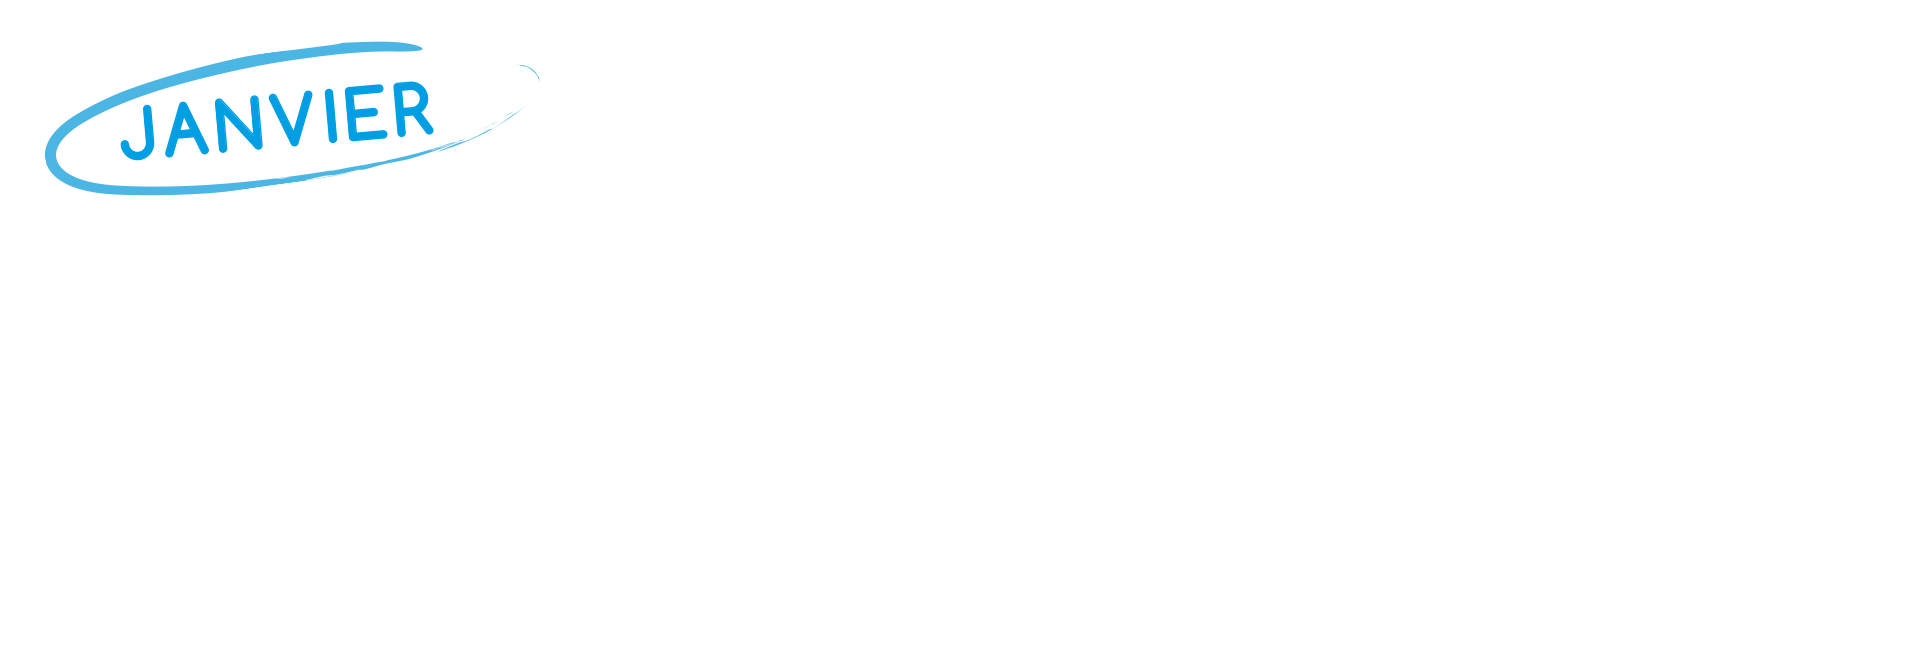 sildemoisblcjanvier.png